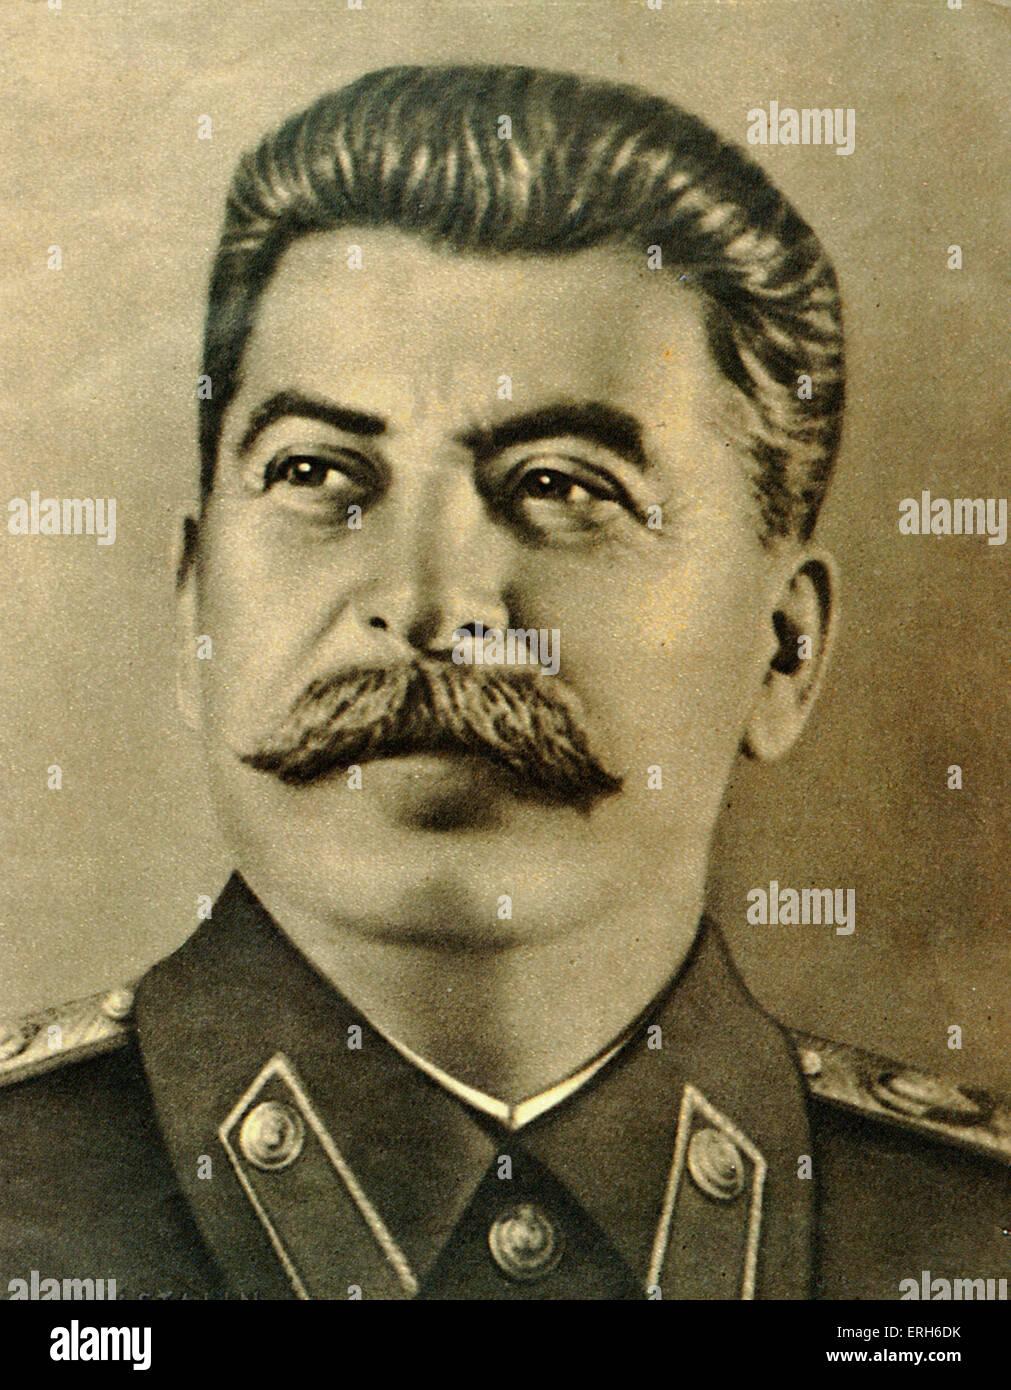 Joseph Stalin portrait. Soviet Russian ruler, leader, dictator.  1879 - 1953. Shostakovich & Prokofiev link. - Stock Image